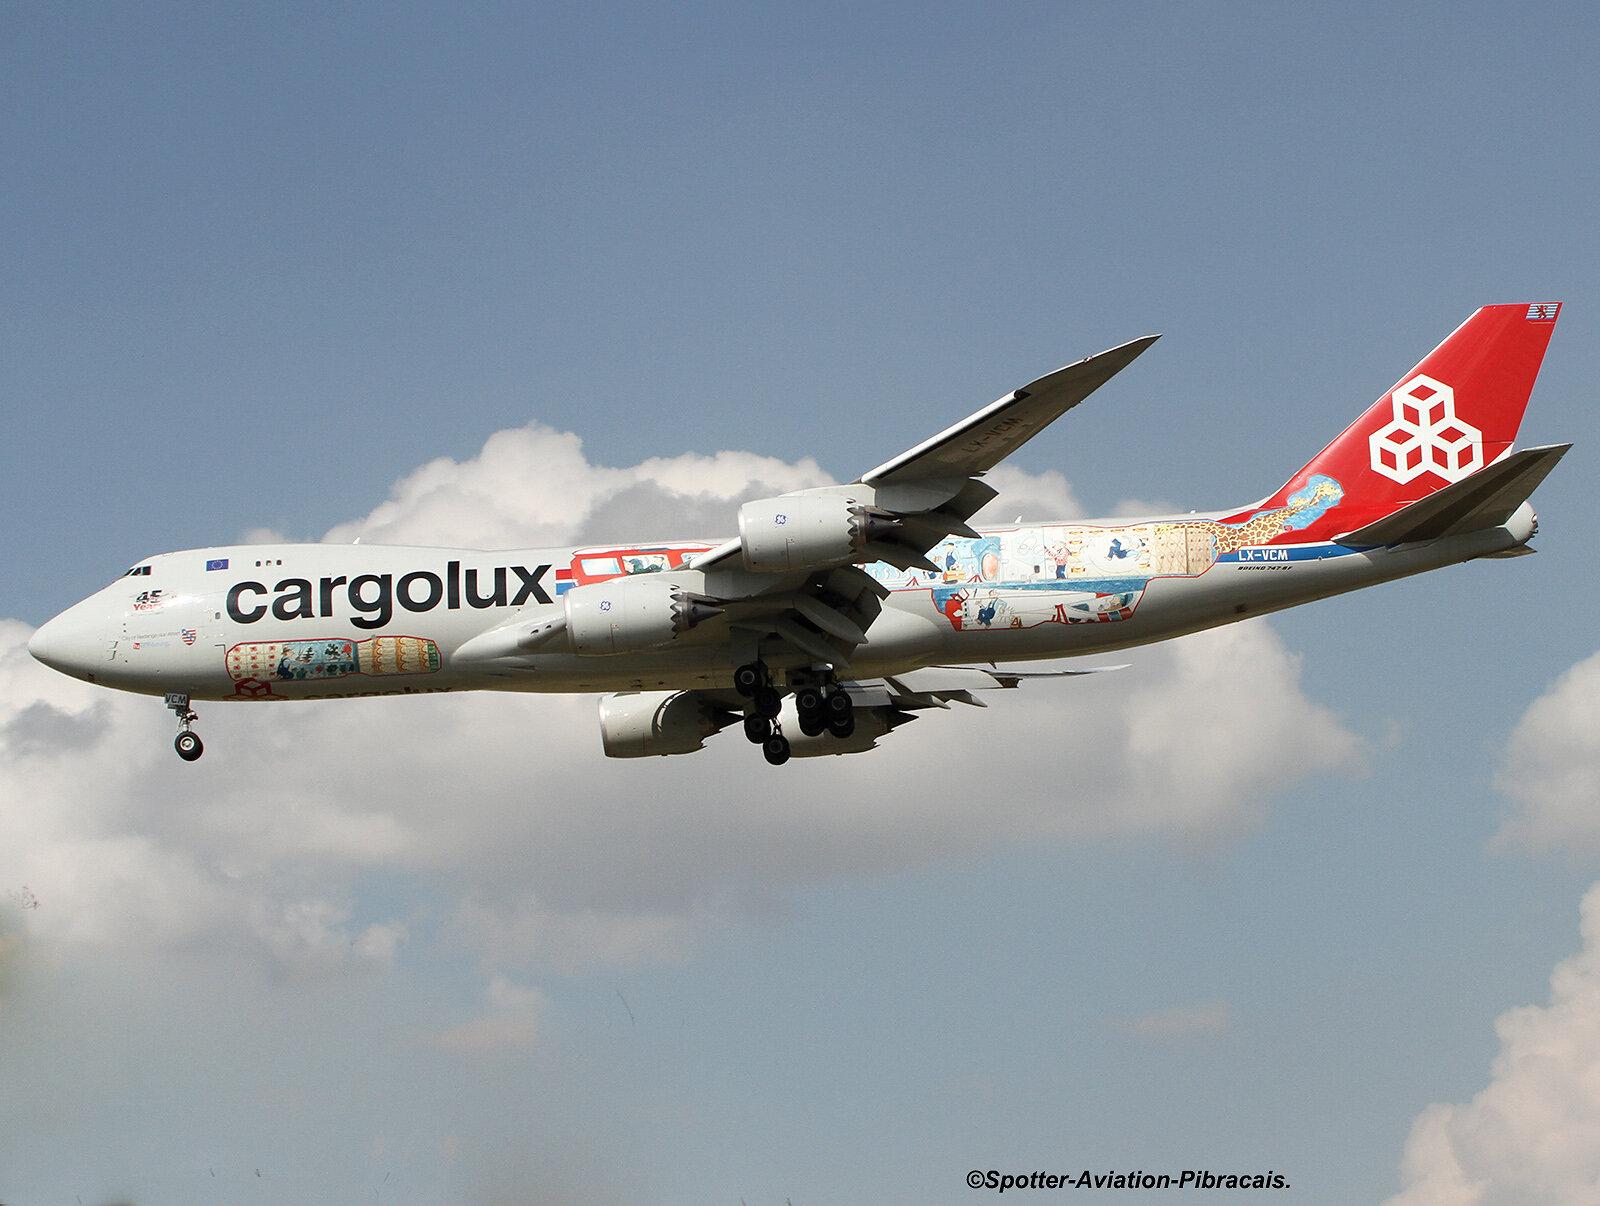 Cargolux Airlines International